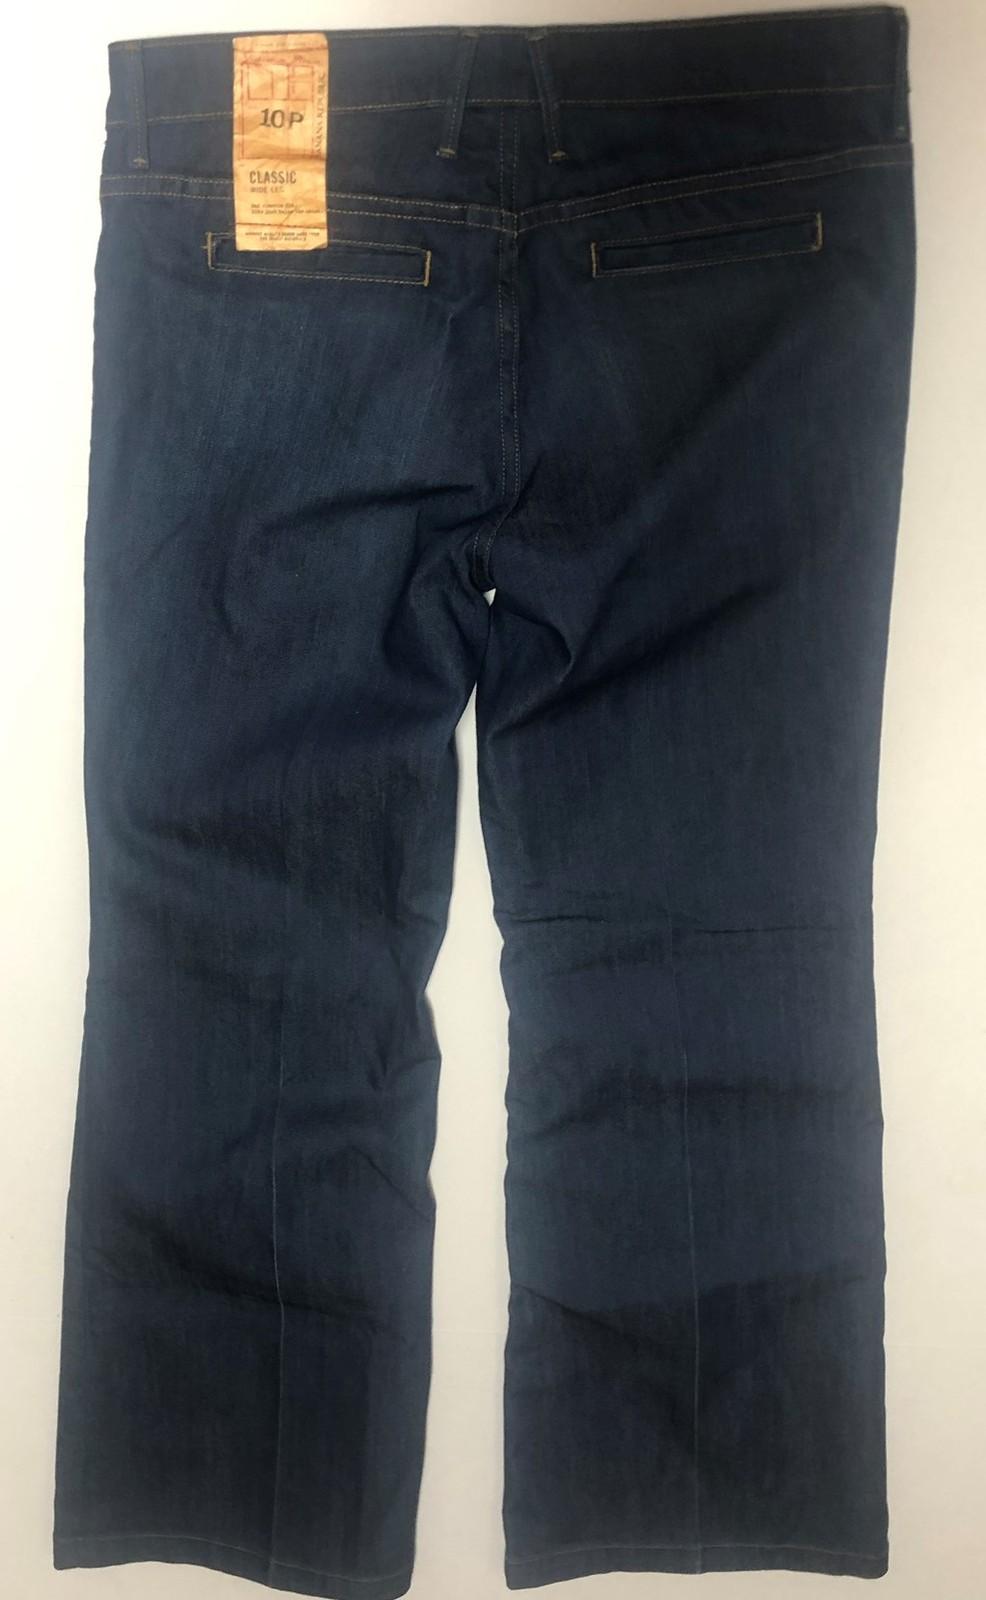 Banana Republic Classic Jeans Sz 10P Stretch Medium Blue Wide Leg image 5